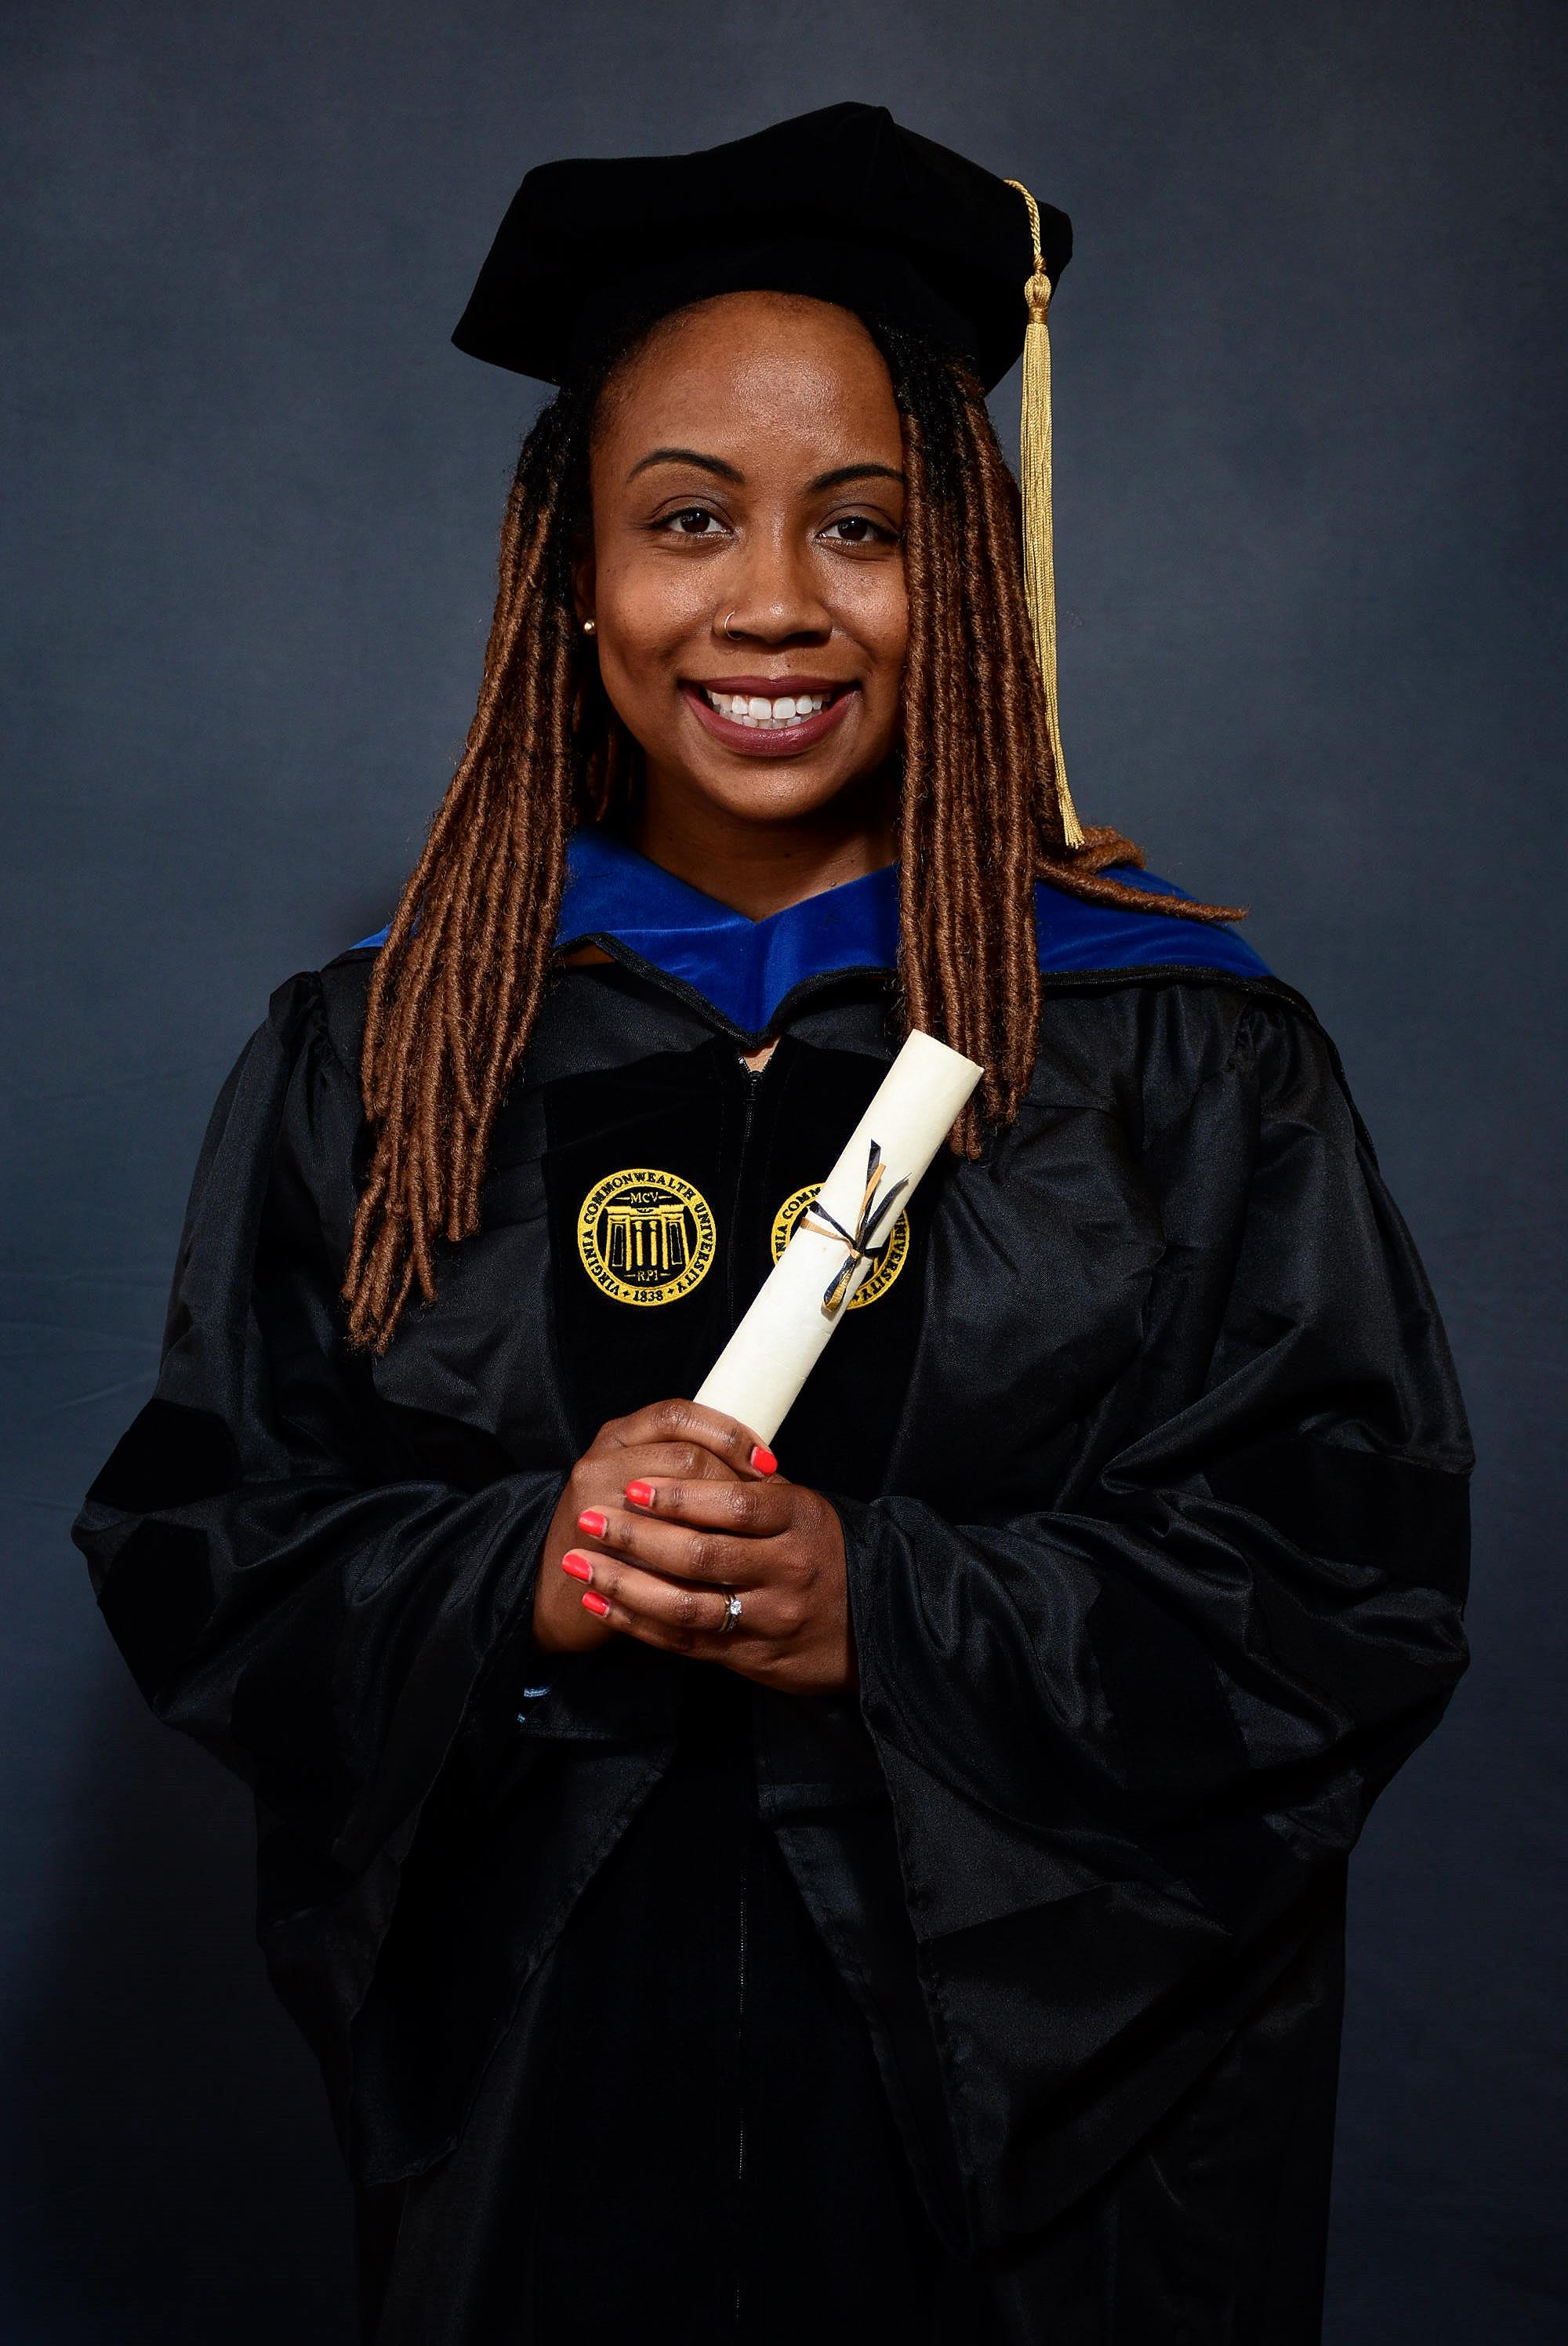 Dr. Kiara Shanay Lee-Heart